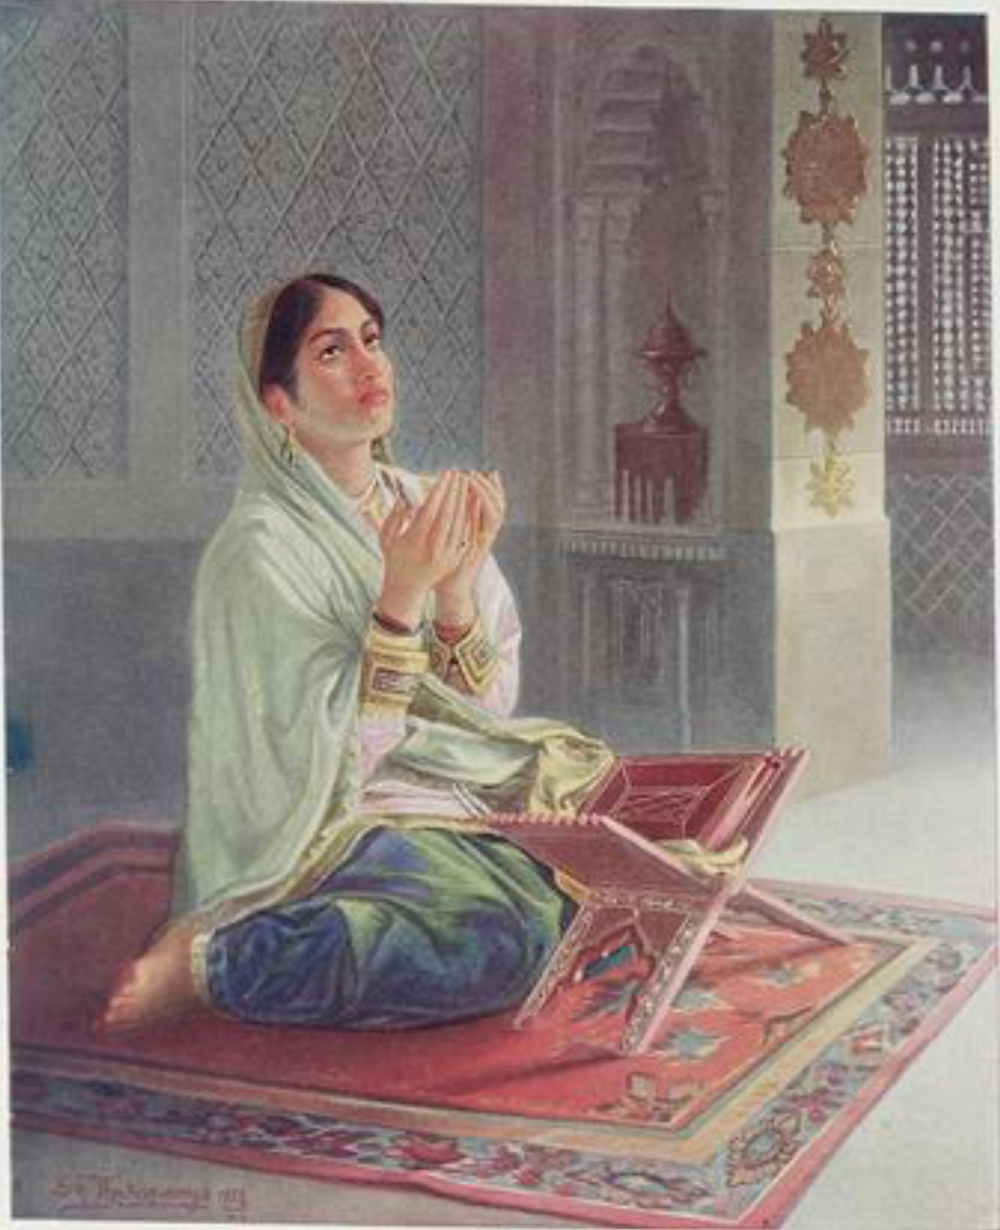 Divine Presence by S.G. Thakur Singh, 1922